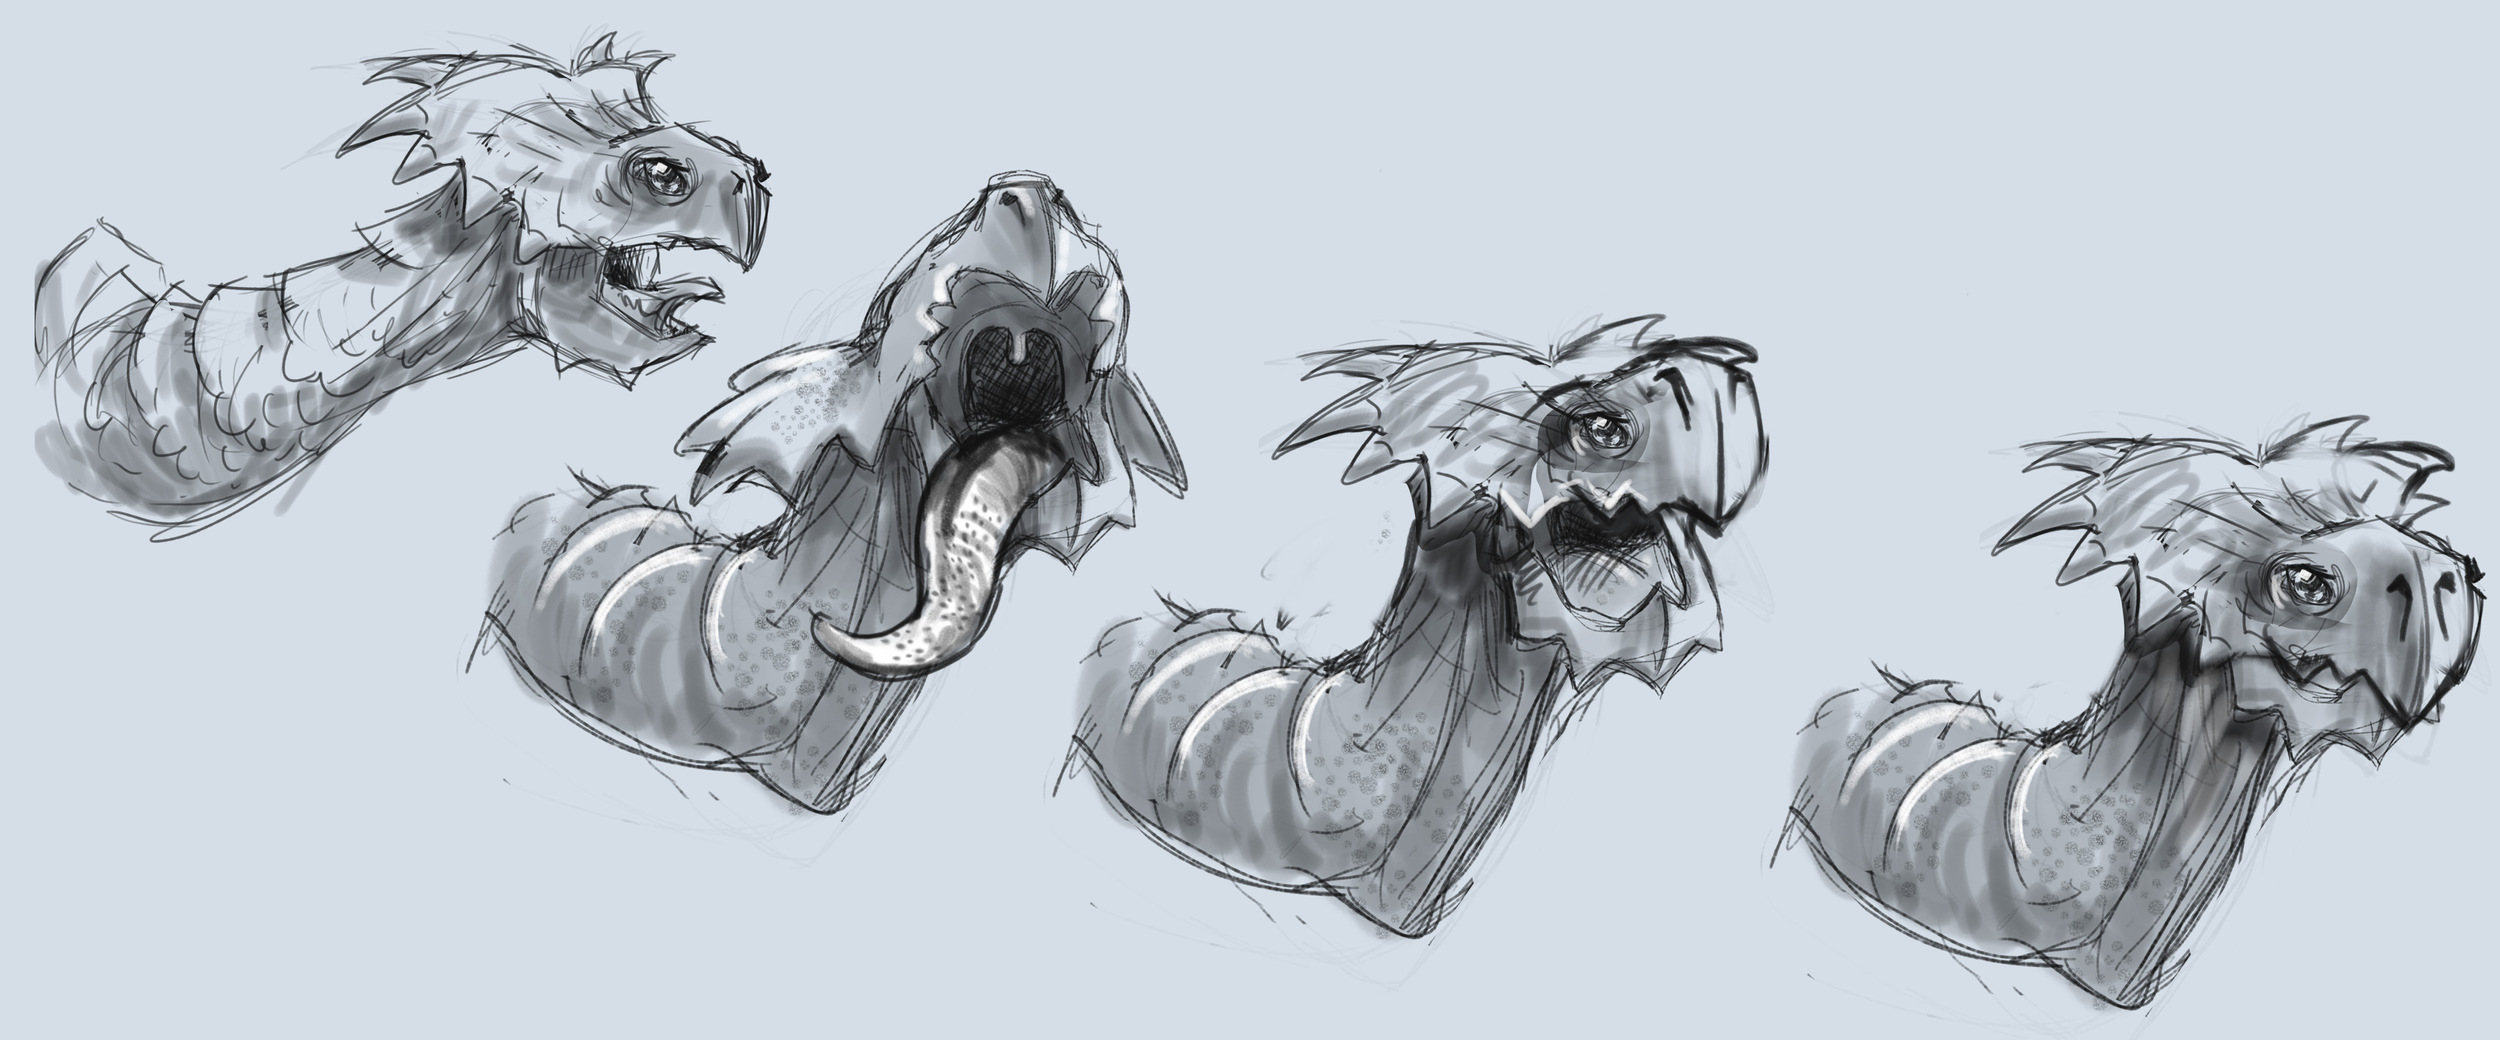 Turtle head concept sketches